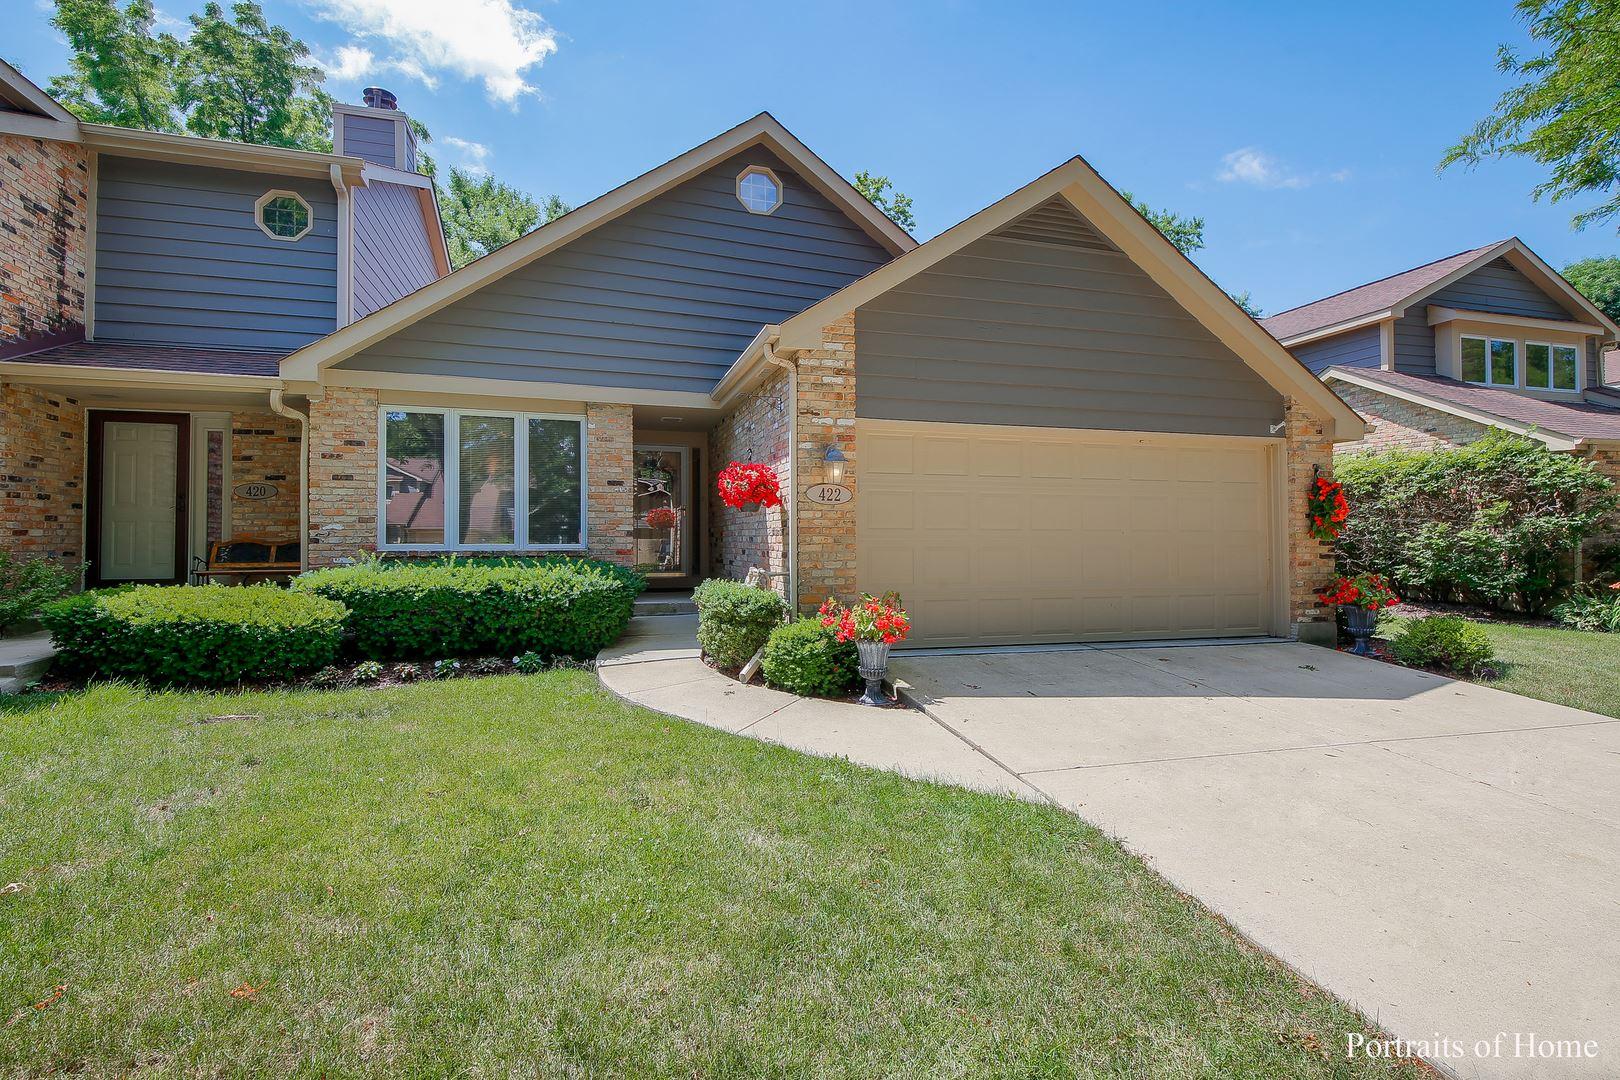 422 W Evergreen Street, Wheaton, IL 60187 - #: 10778148